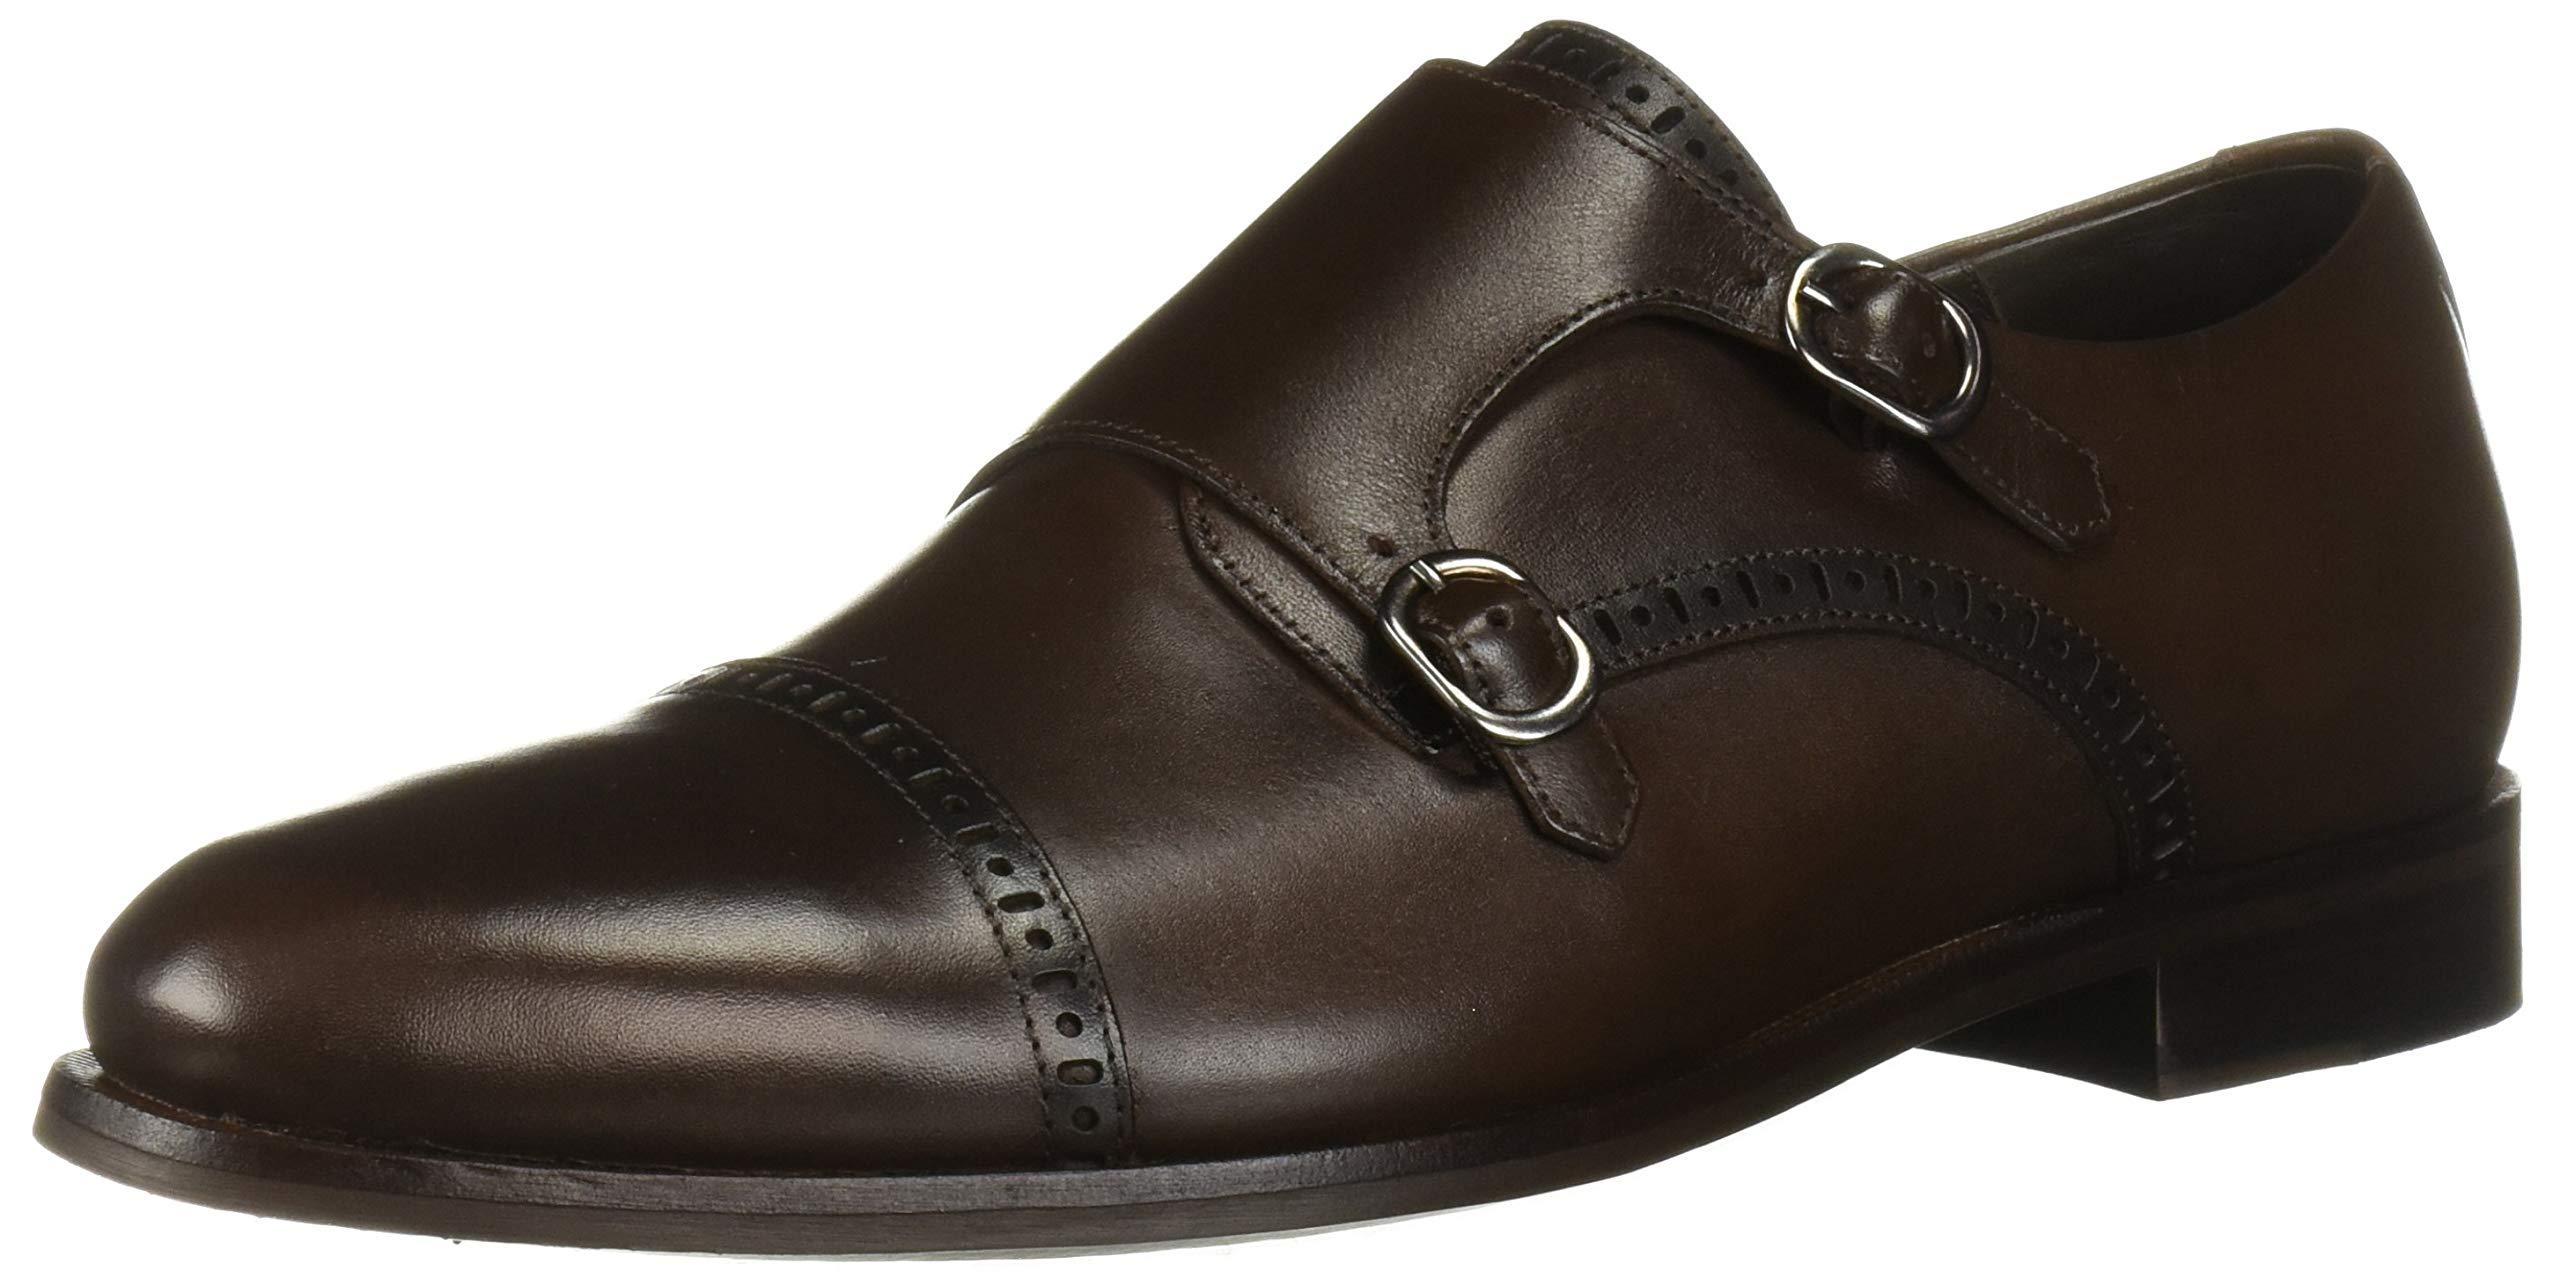 MARC JOSEPH NEW YORK Mens Leather Double Monk Dress Shoe Oxford